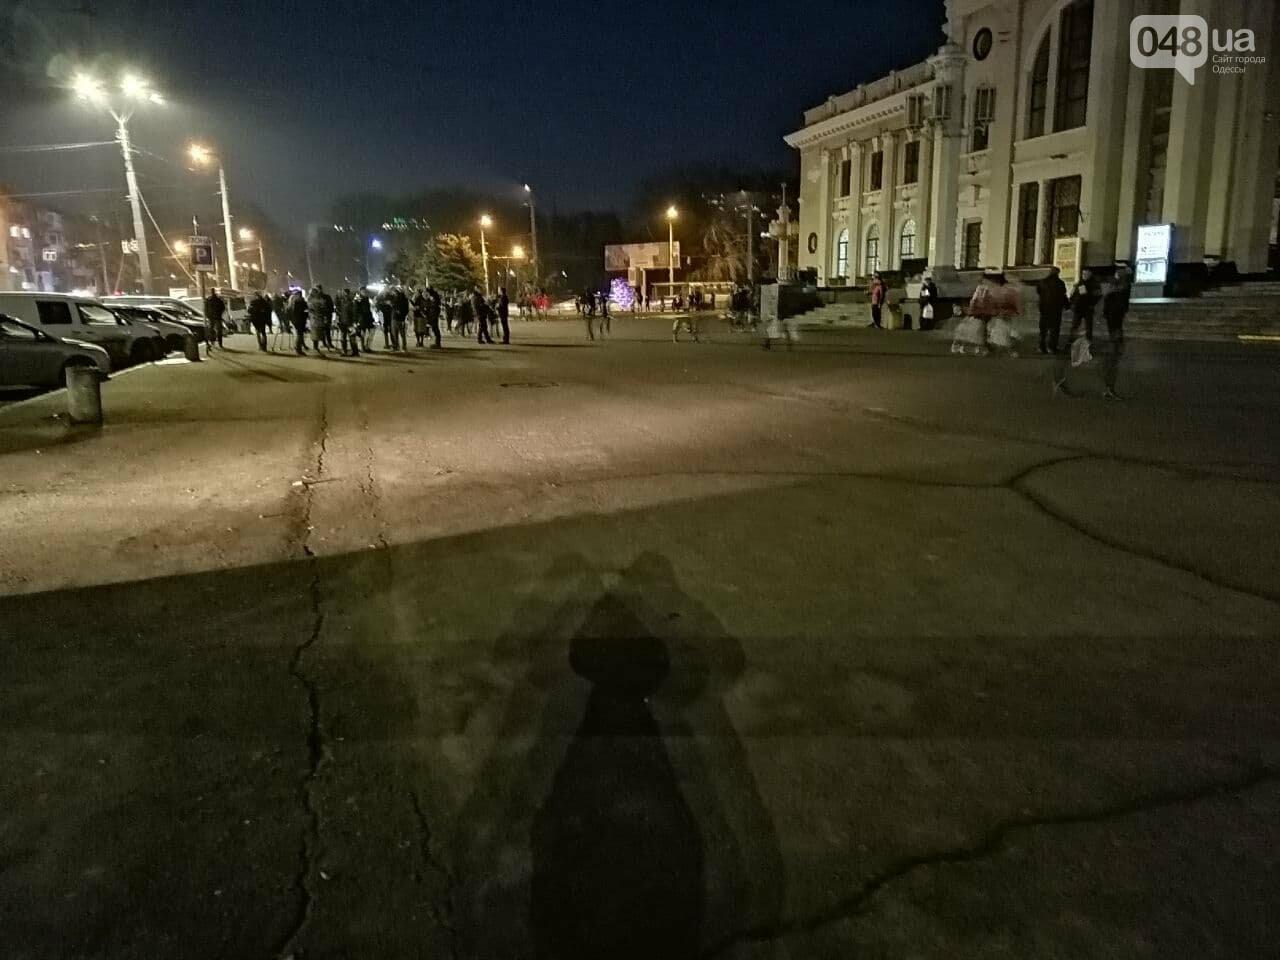 В Одессе таксисты позвали всех на митинг, а сами не приехали,- ФОТО, фото-1